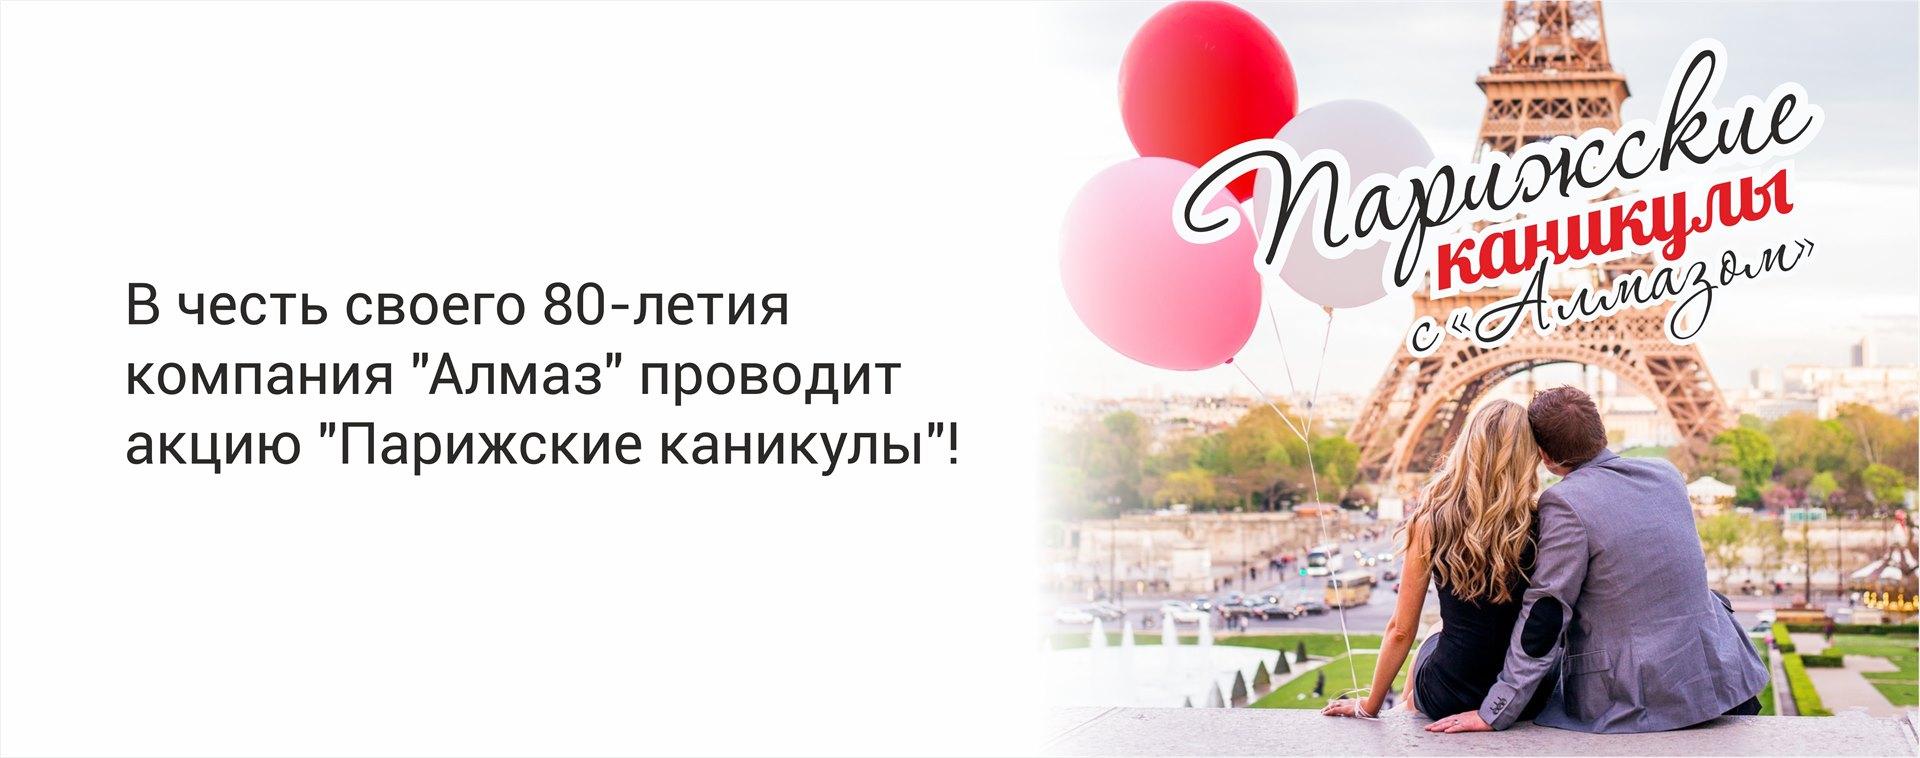 https://www.almazcom.ru/pub/img/QA/actions/Parizh_aktsiya.jpg